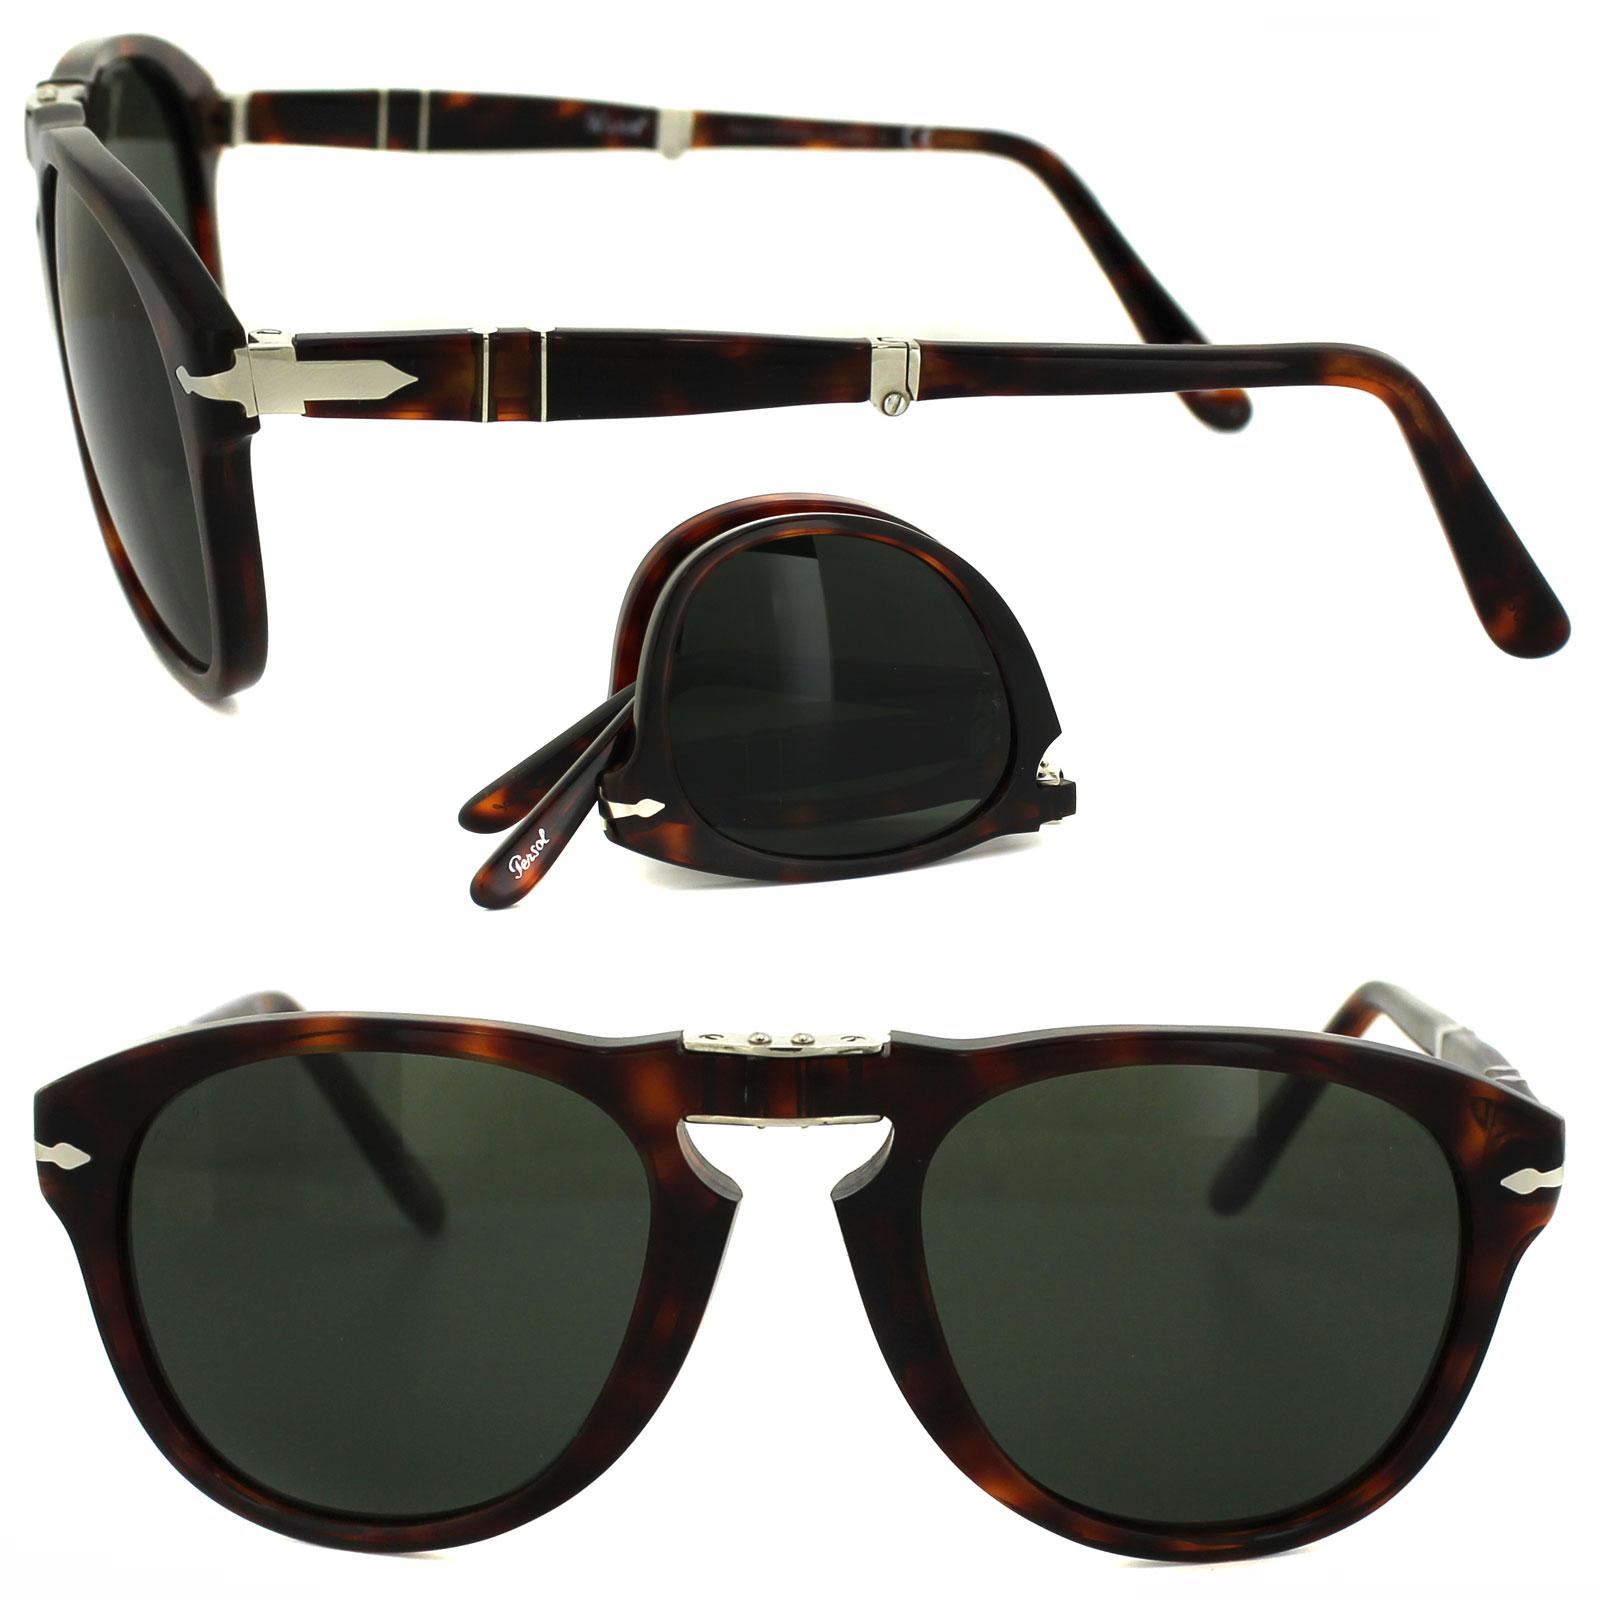 Cheap Persol 714 Sunglasses Discounted Sunglasses